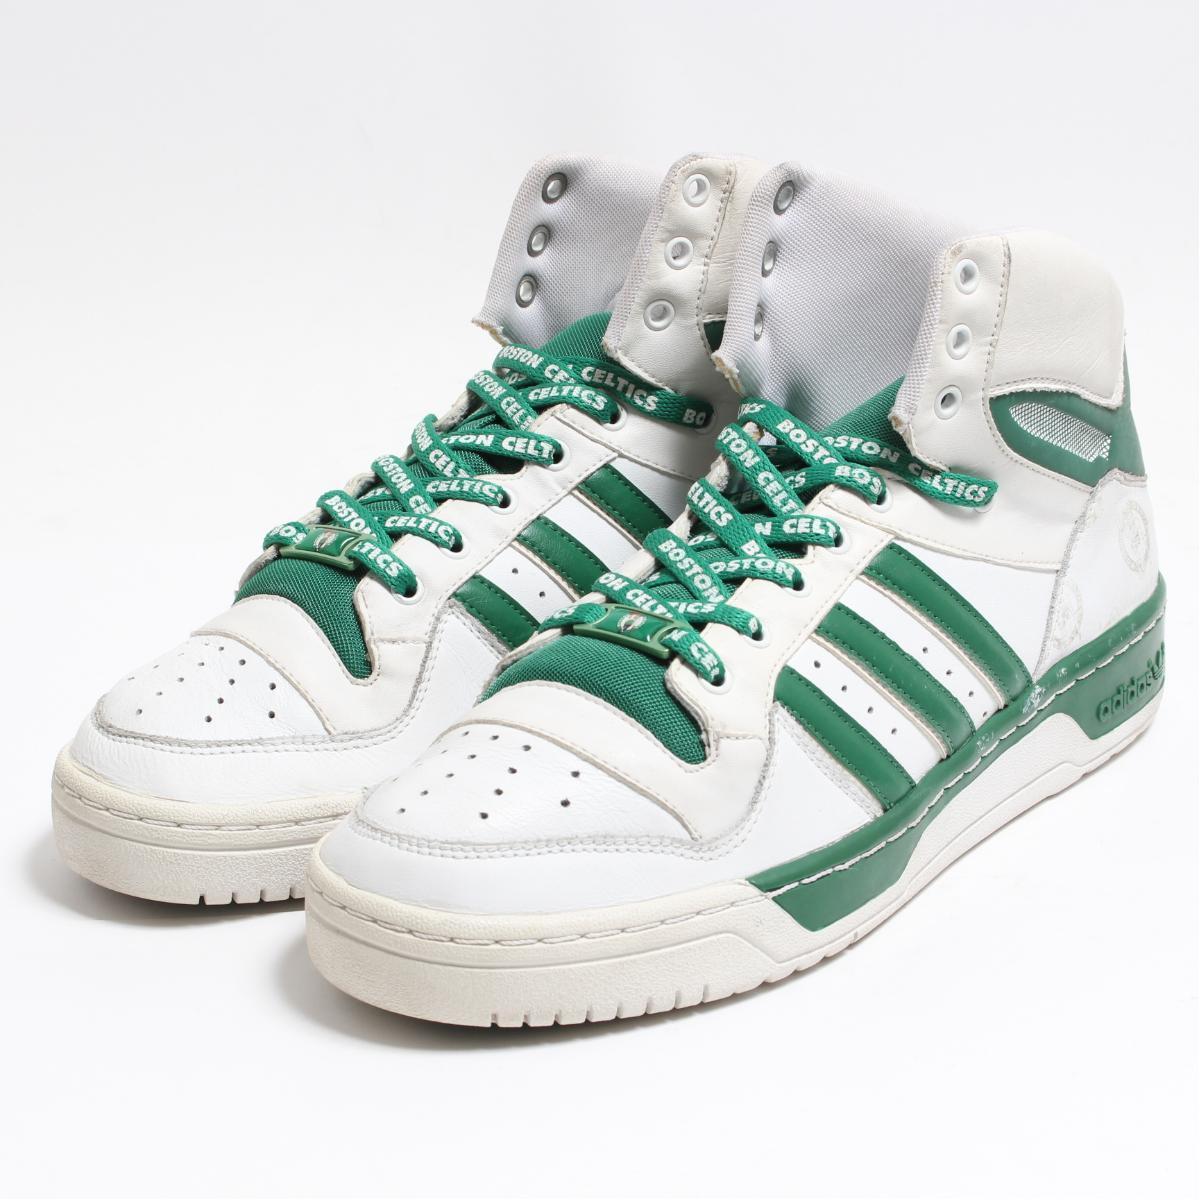 6ad869405ff Adidas adidas ATTITUDE HI NBA Boston Celtics higher frequency elimination  sneakers men 28.5cm  bon4324